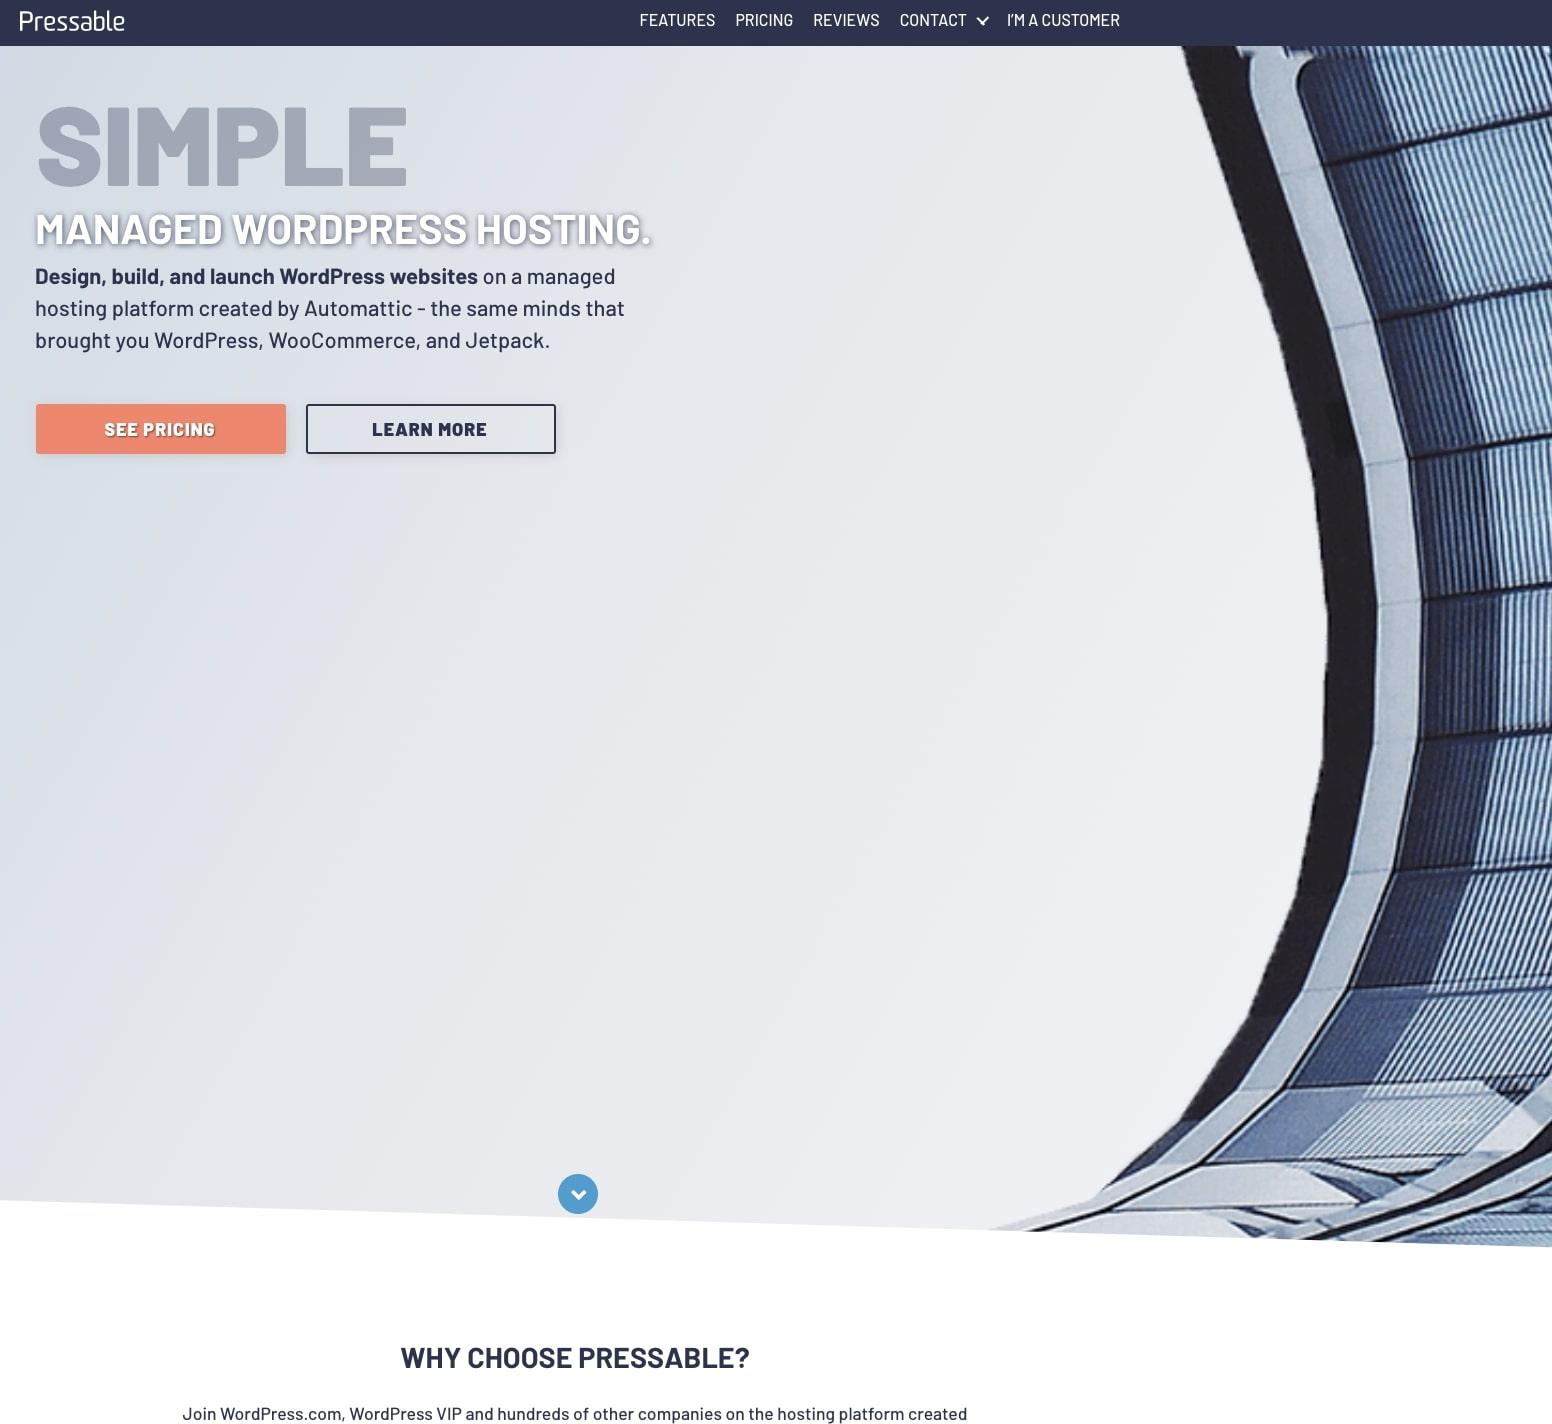 Pressable web hosting